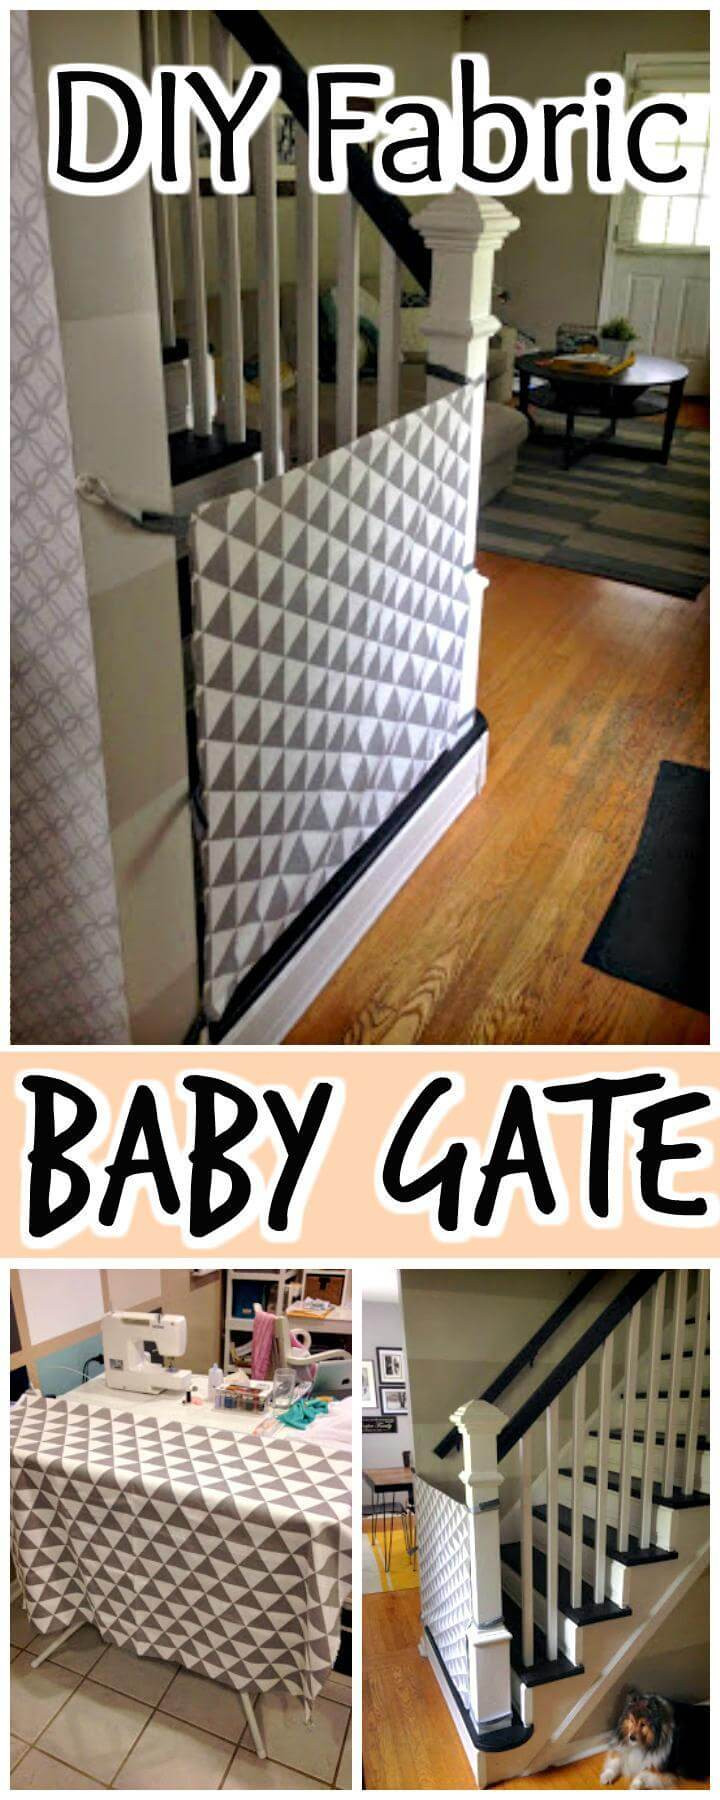 Diy Fabric Baby Gate  30 Best DIY Baby Gate Tutorials on Cheap Bud